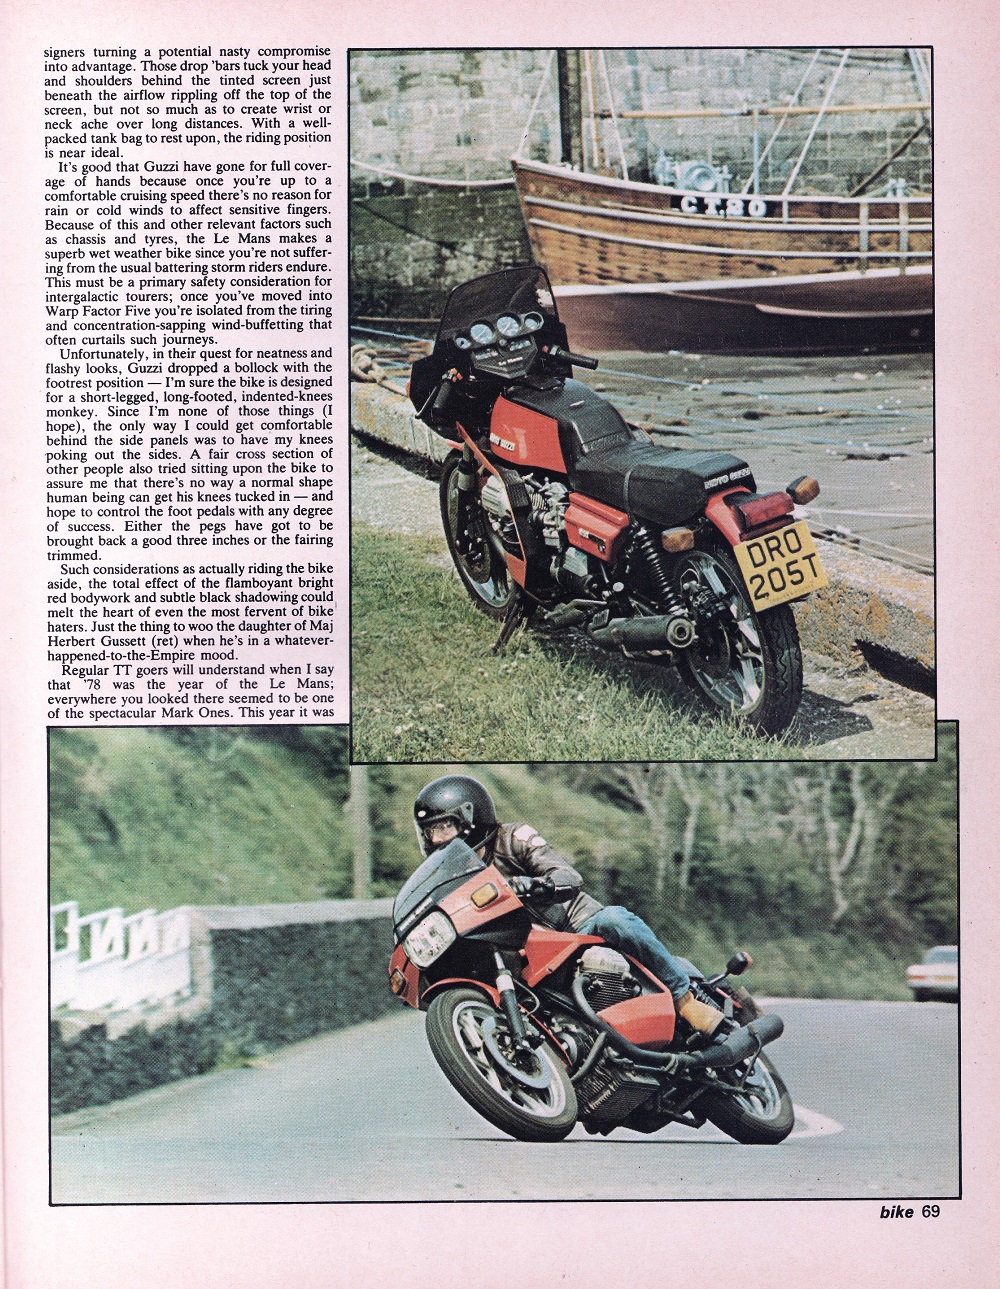 1979 Moto Guzzi Le Mans MK II road test.2.jpg